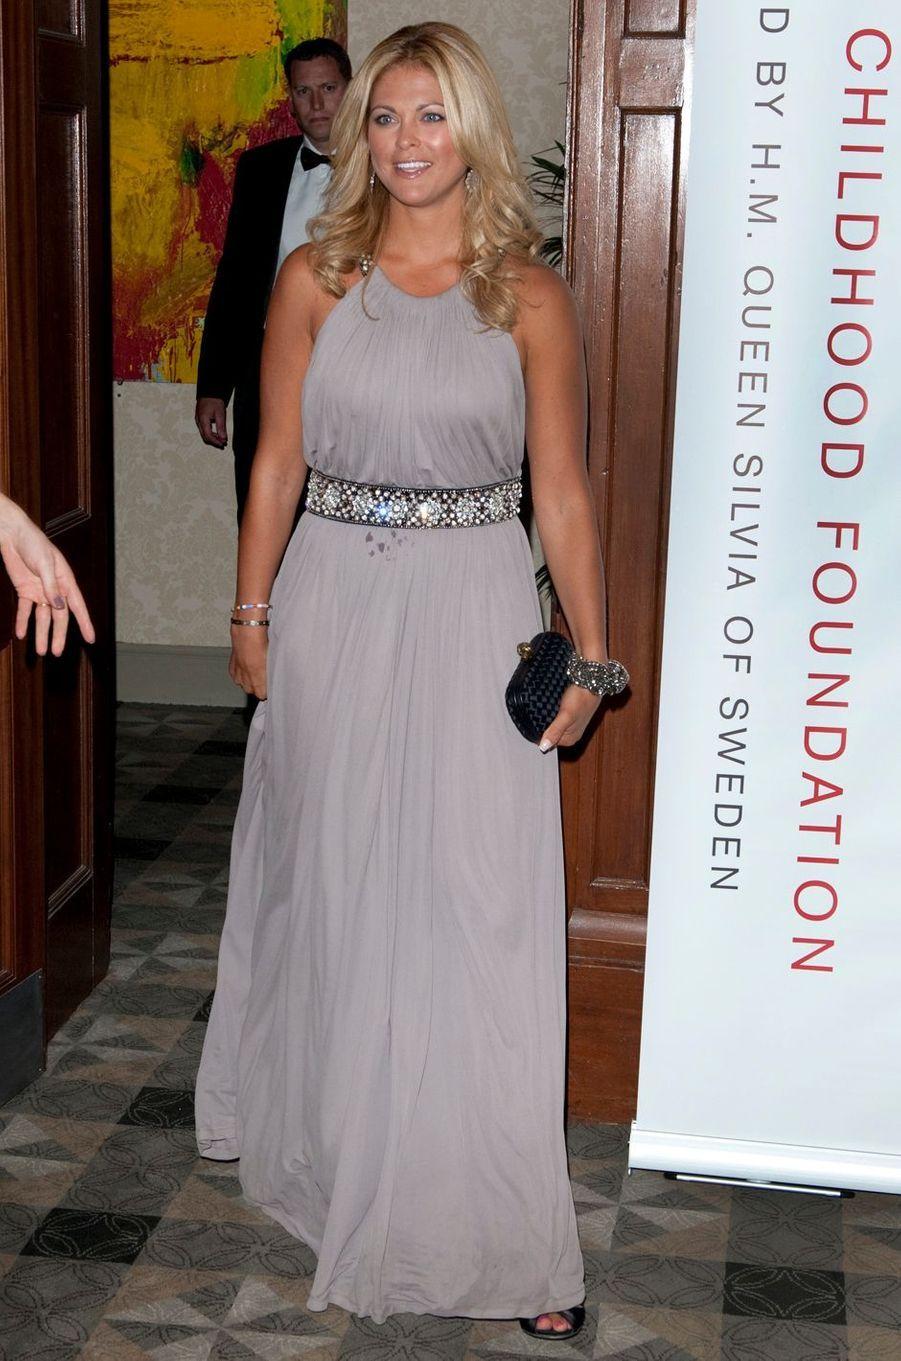 La princesse Madeleine de Suède dans une robe Amanda Wakeley le 30 juin 2010